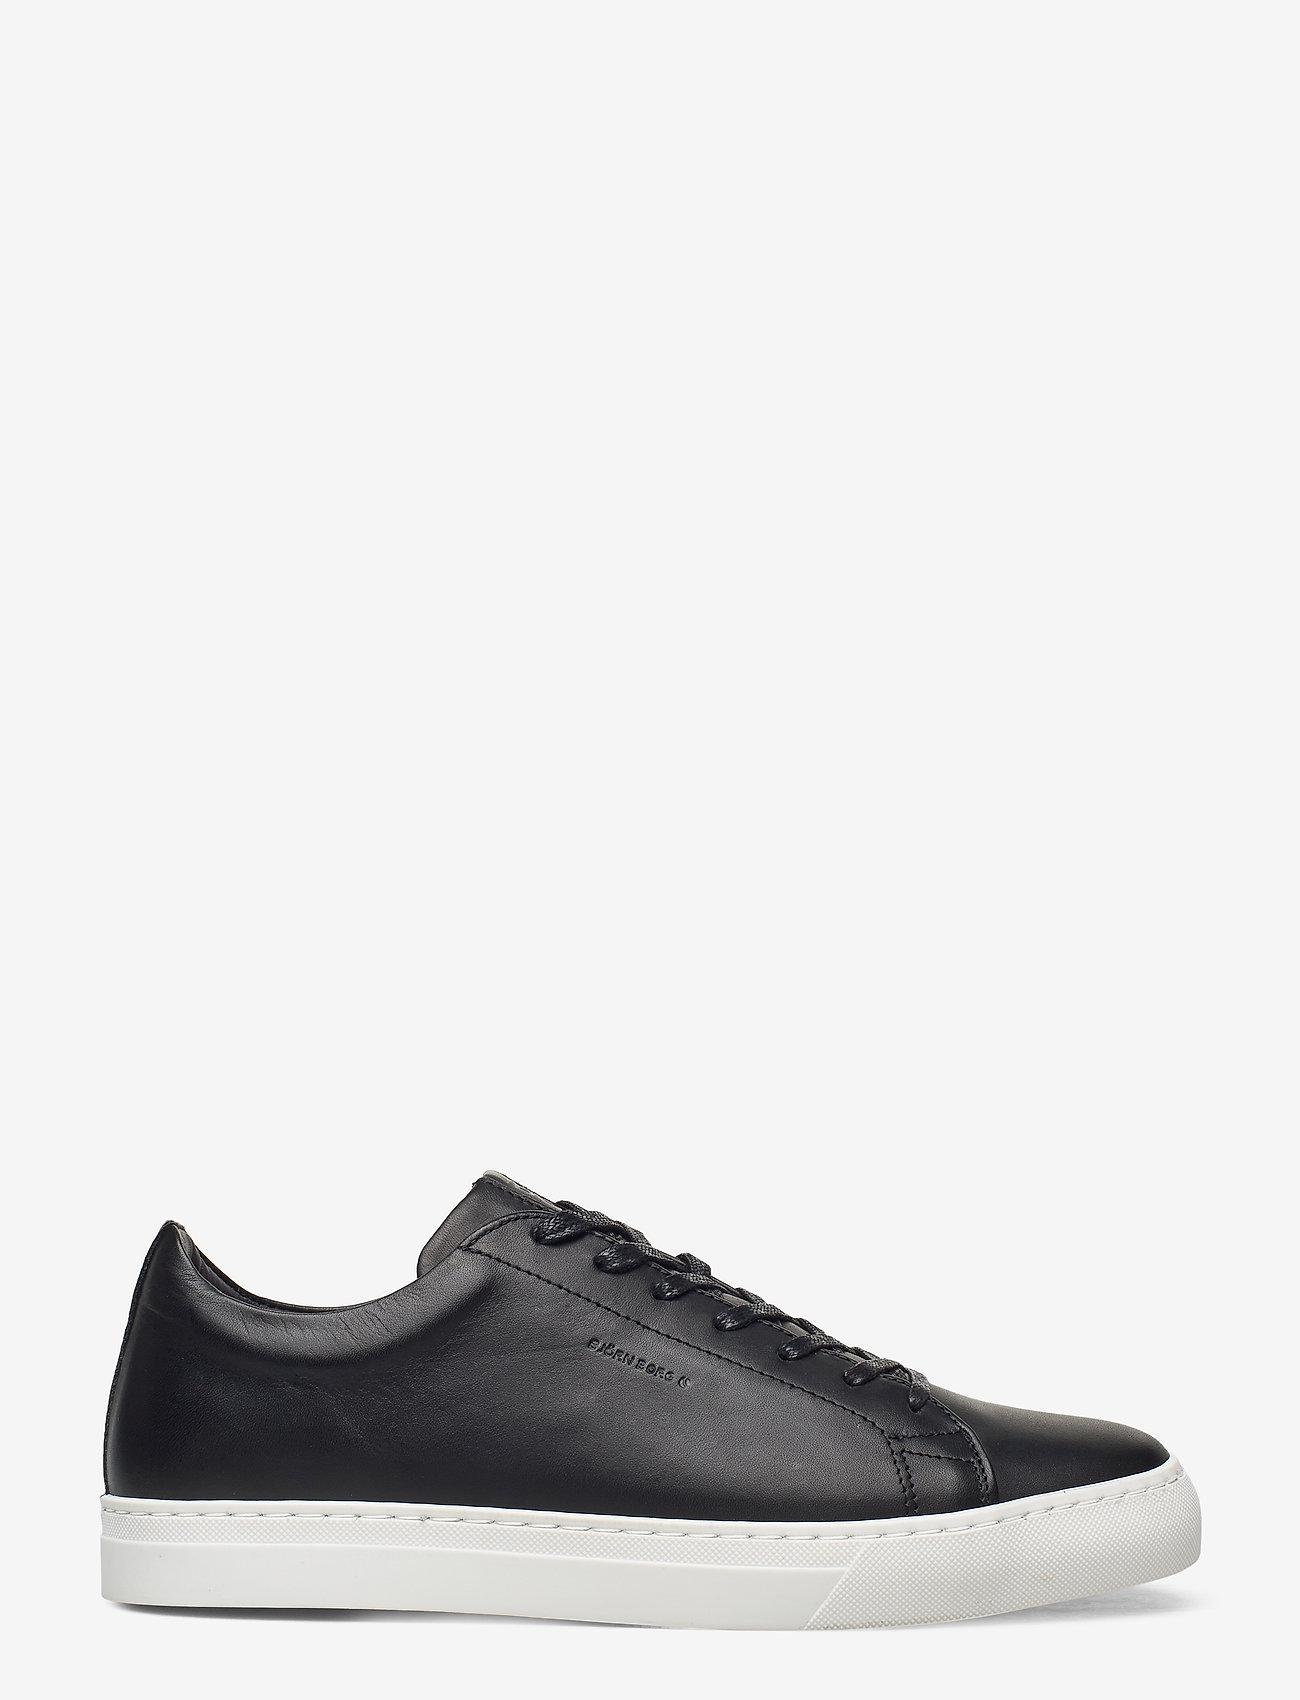 Björn Borg - JORDEN LEA M - laag sneakers - black - 1